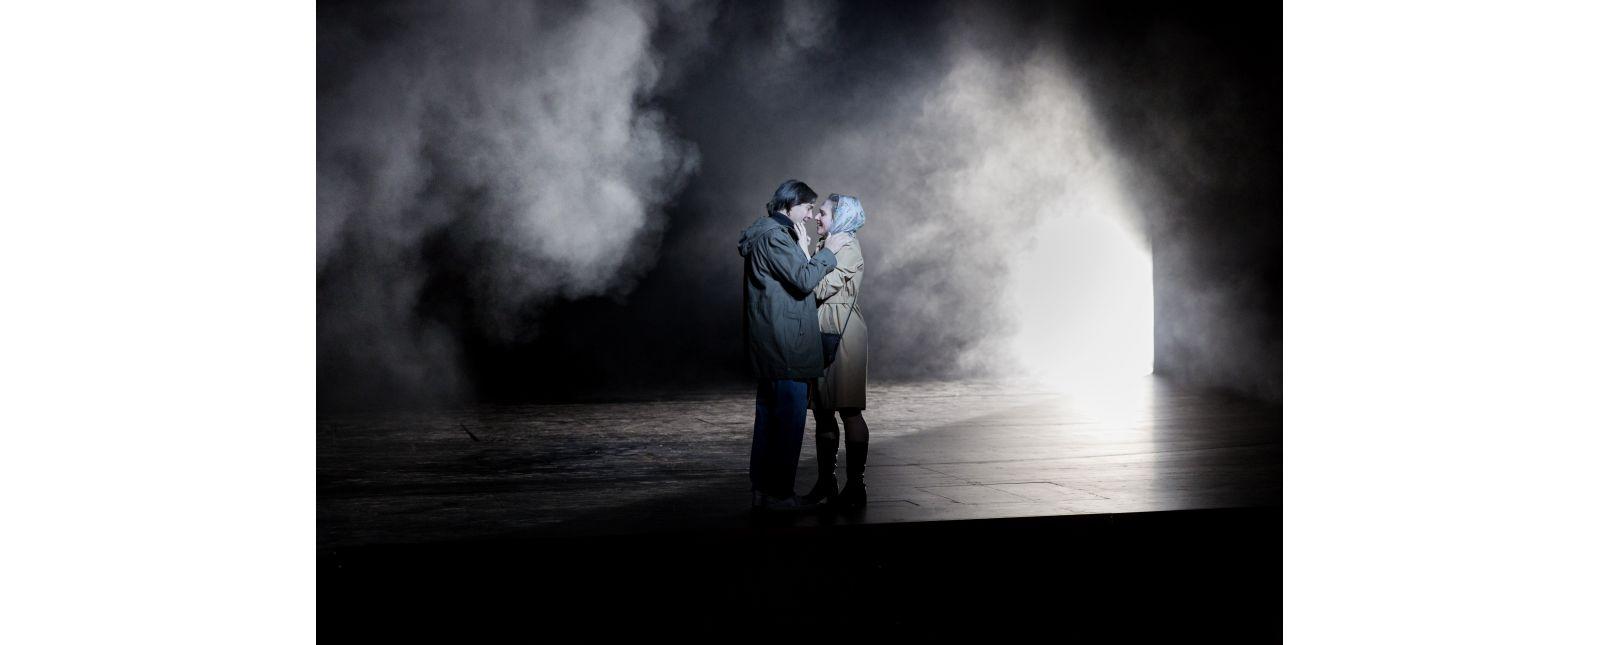 Katja Kabanowa // Harold Meers, Anna-Maria Kalesidis // Rainer Muranyi // 2018